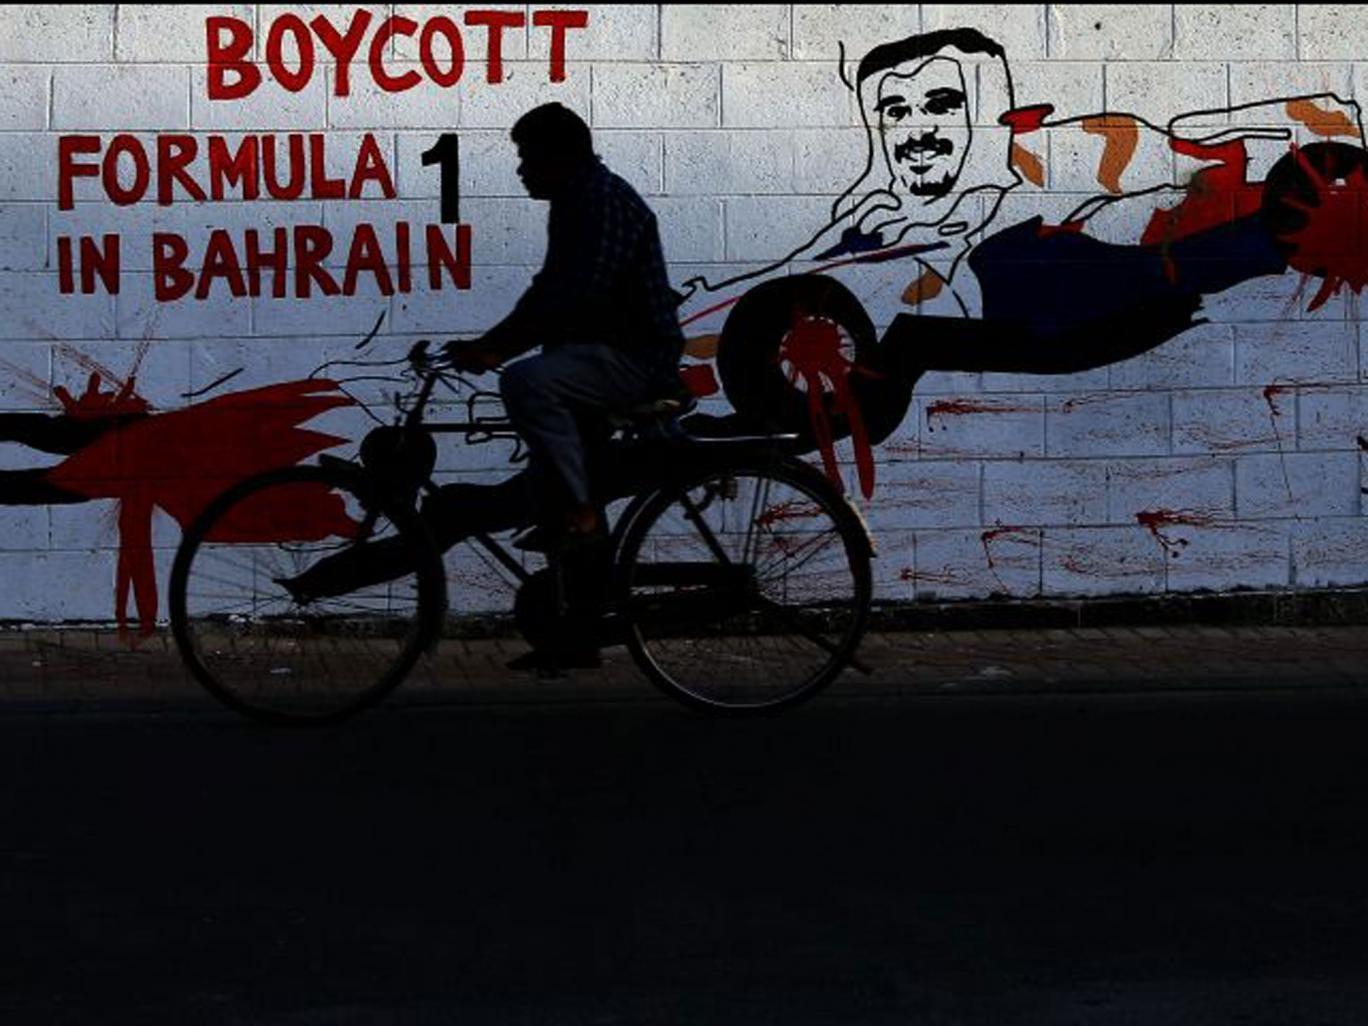 Graffiti in Bharain shows Crown Prince Salman Al Khalifa in a racing car with blood on its wheels